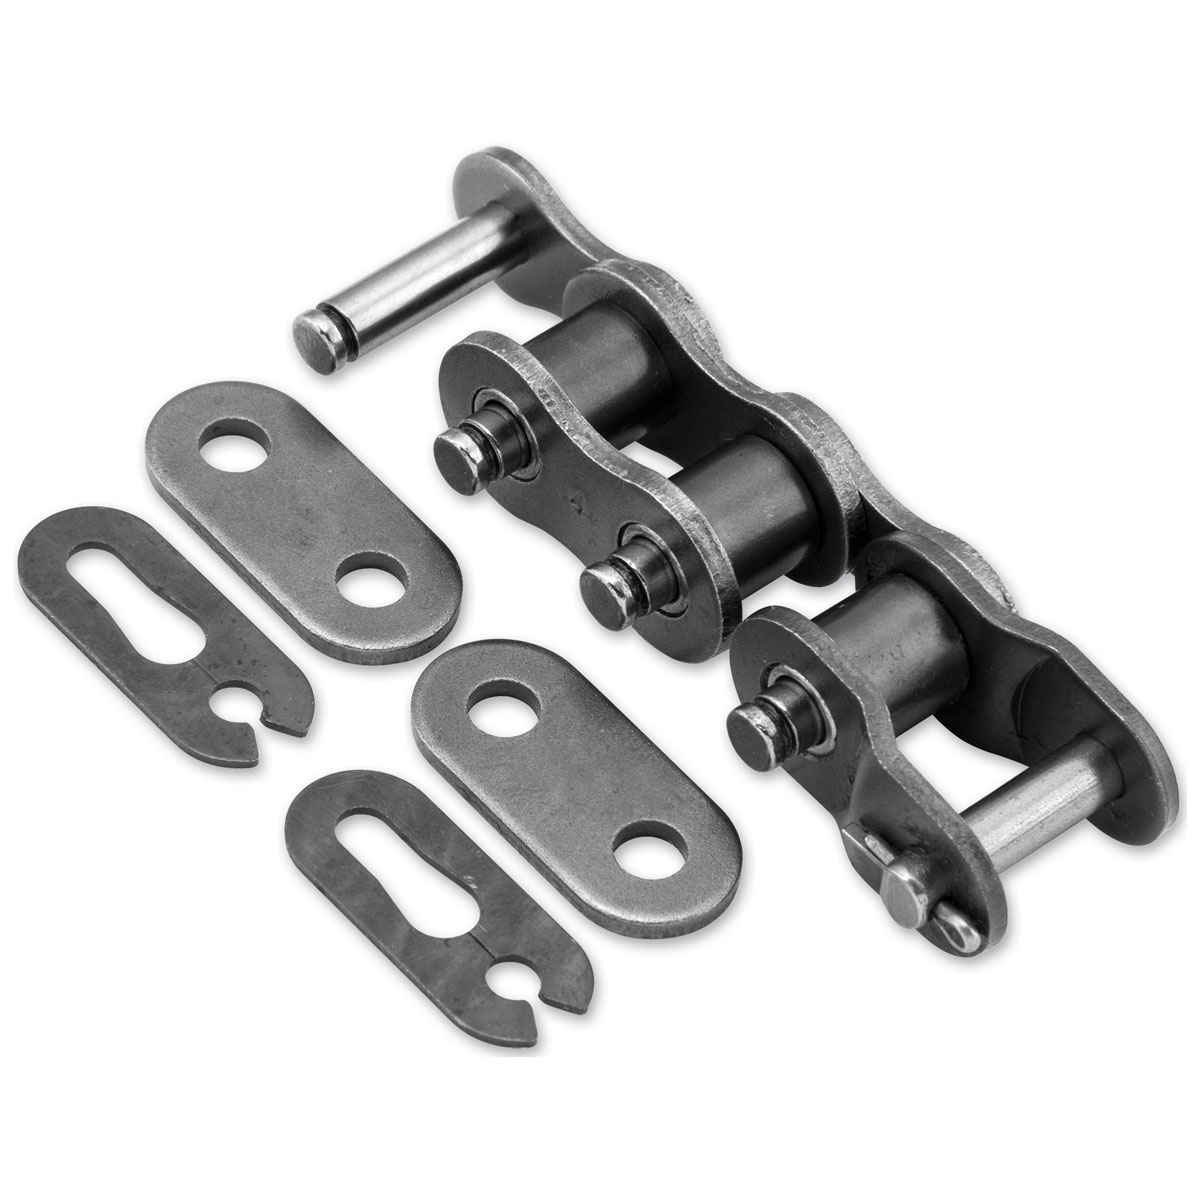 BikeMaster 530 Precision Roller Chain Clip Link Kit